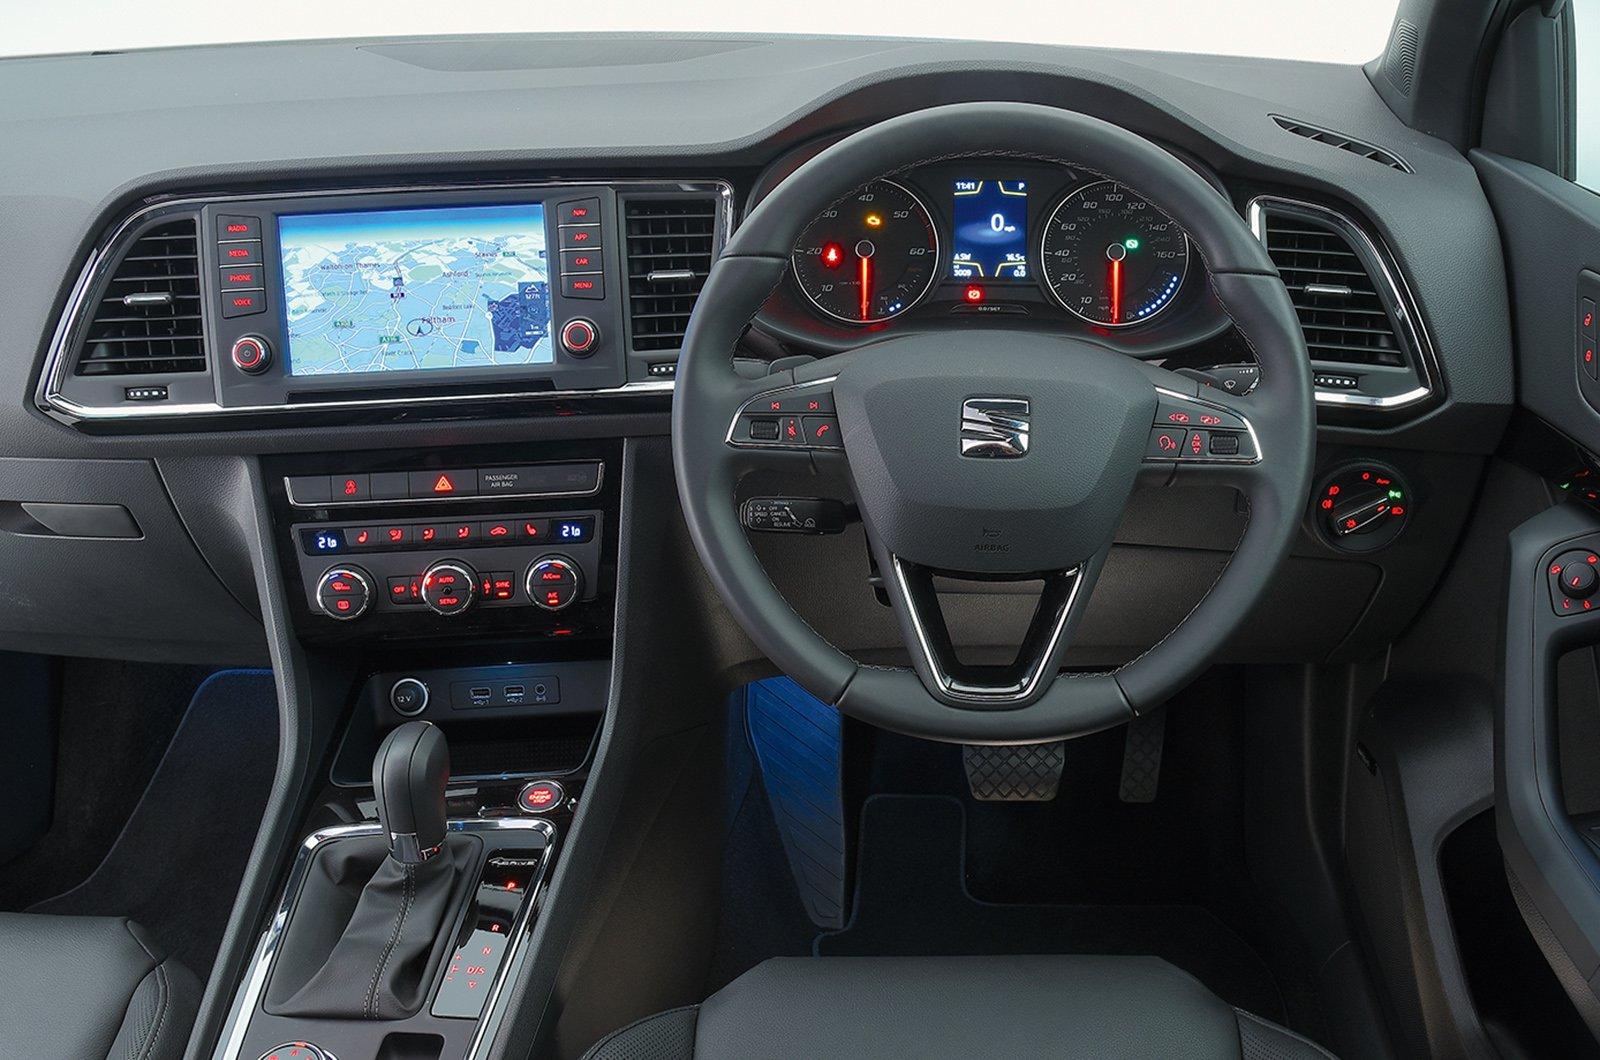 Used test: Seat Ateca vs Volkswagen Tiguan | What Car?